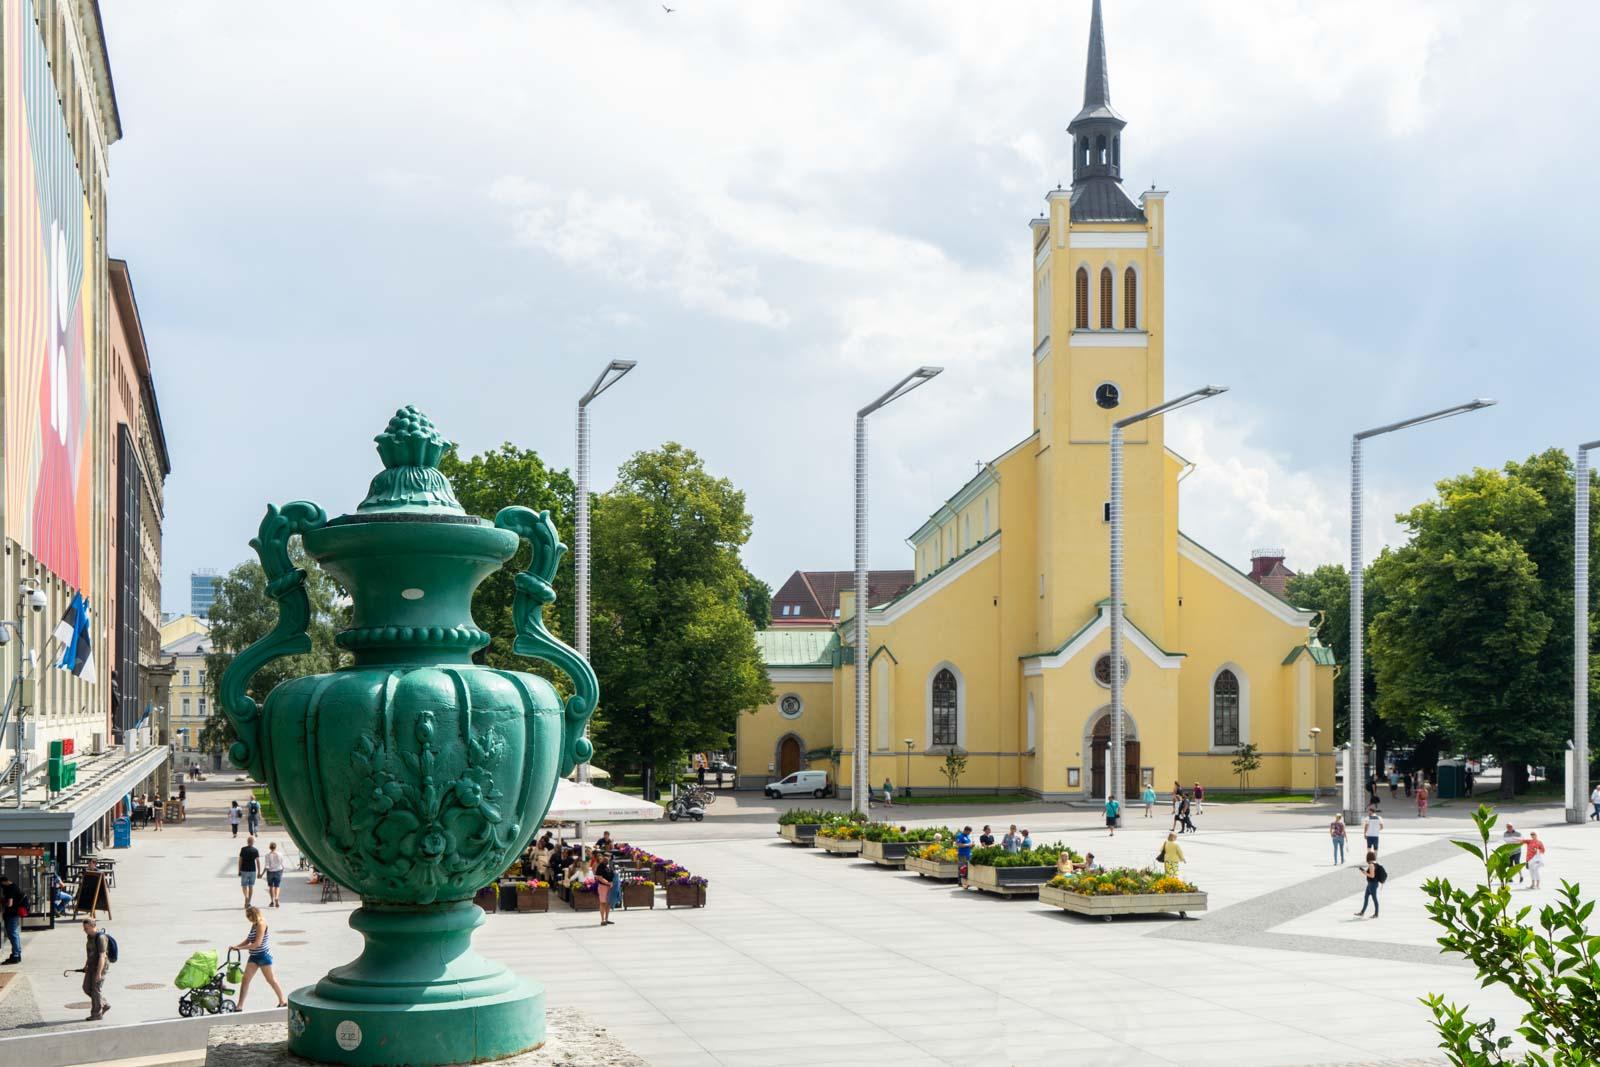 St John's Church, Tallinn, Estonia